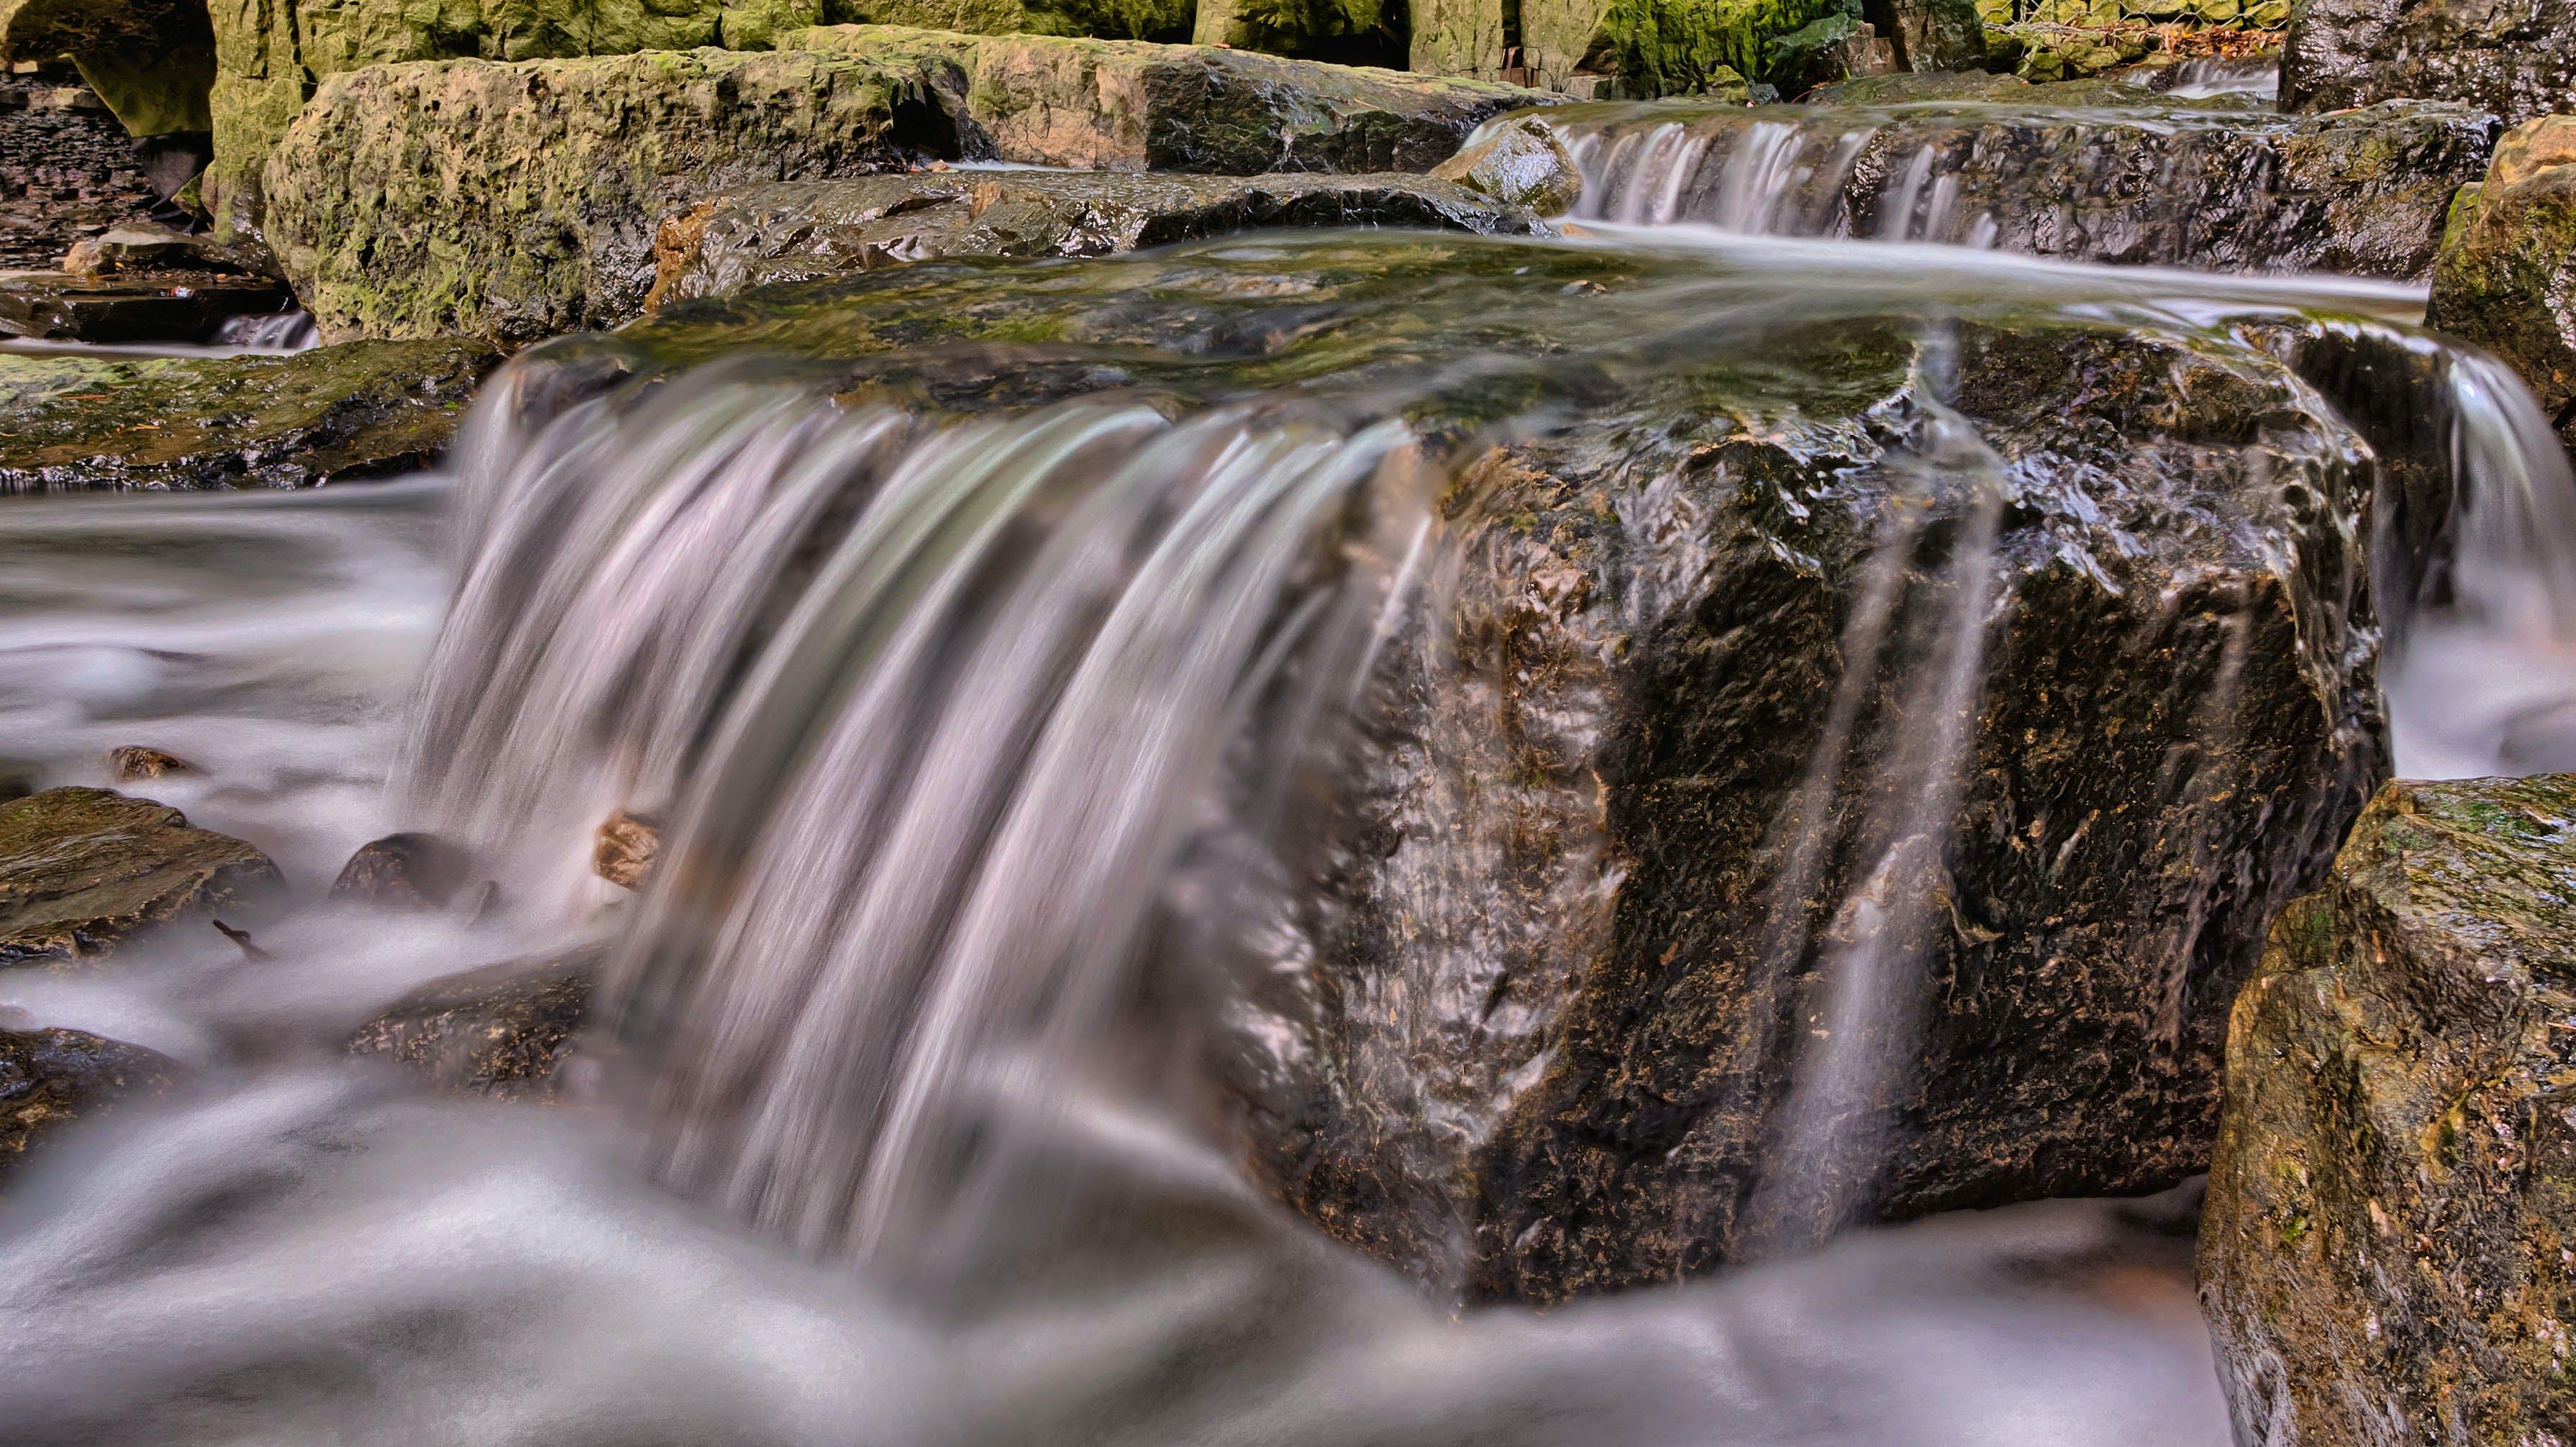 Kostenloses Stock Foto zu landschaft, wasser, felsen, bach